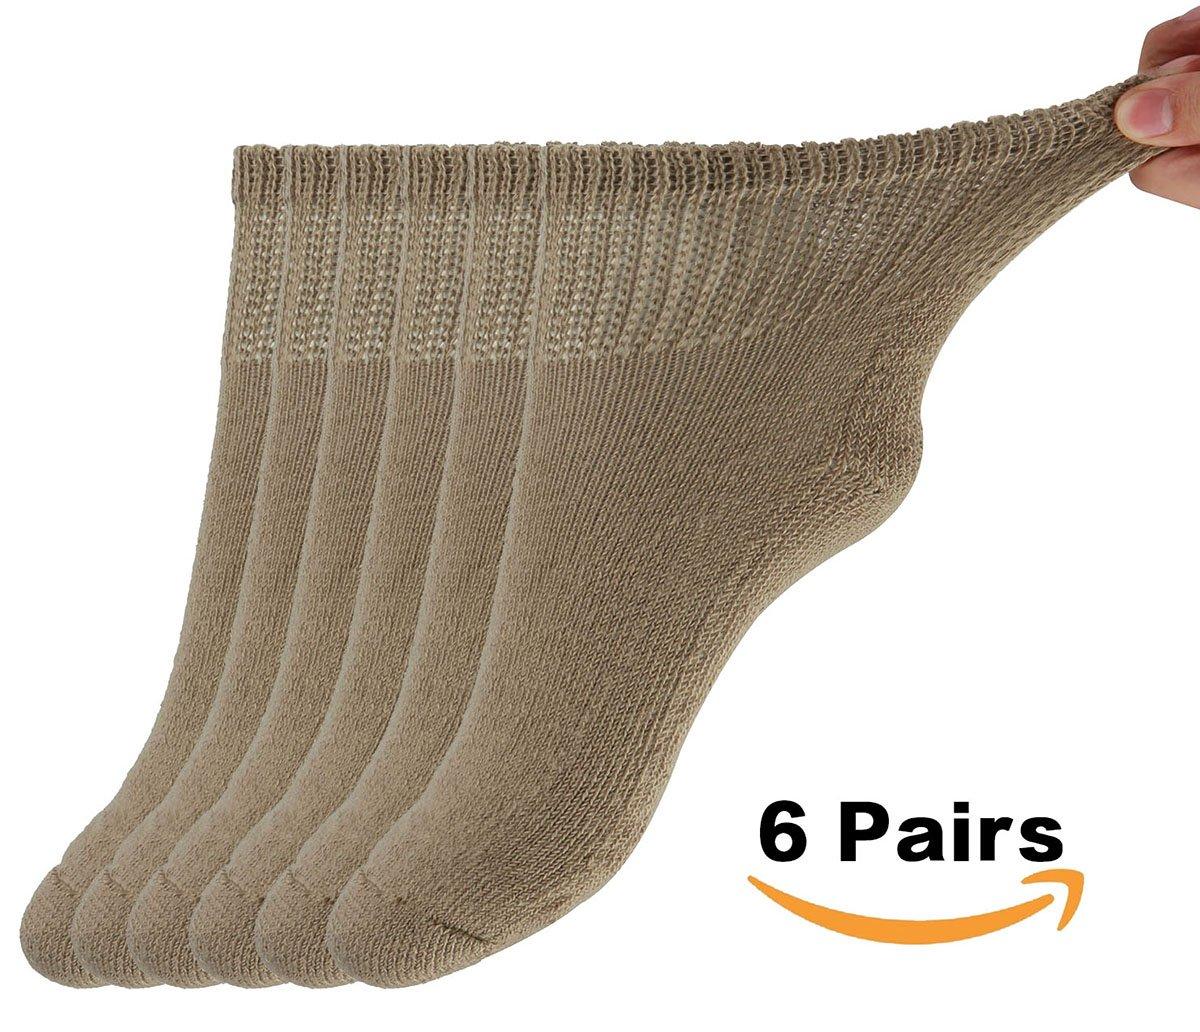 MD Diabetic Socks Mens and Womens Half Cushion Circulatory Quarter Socks for All Seasons Loose Fit 6 Pack 9-11 Brown